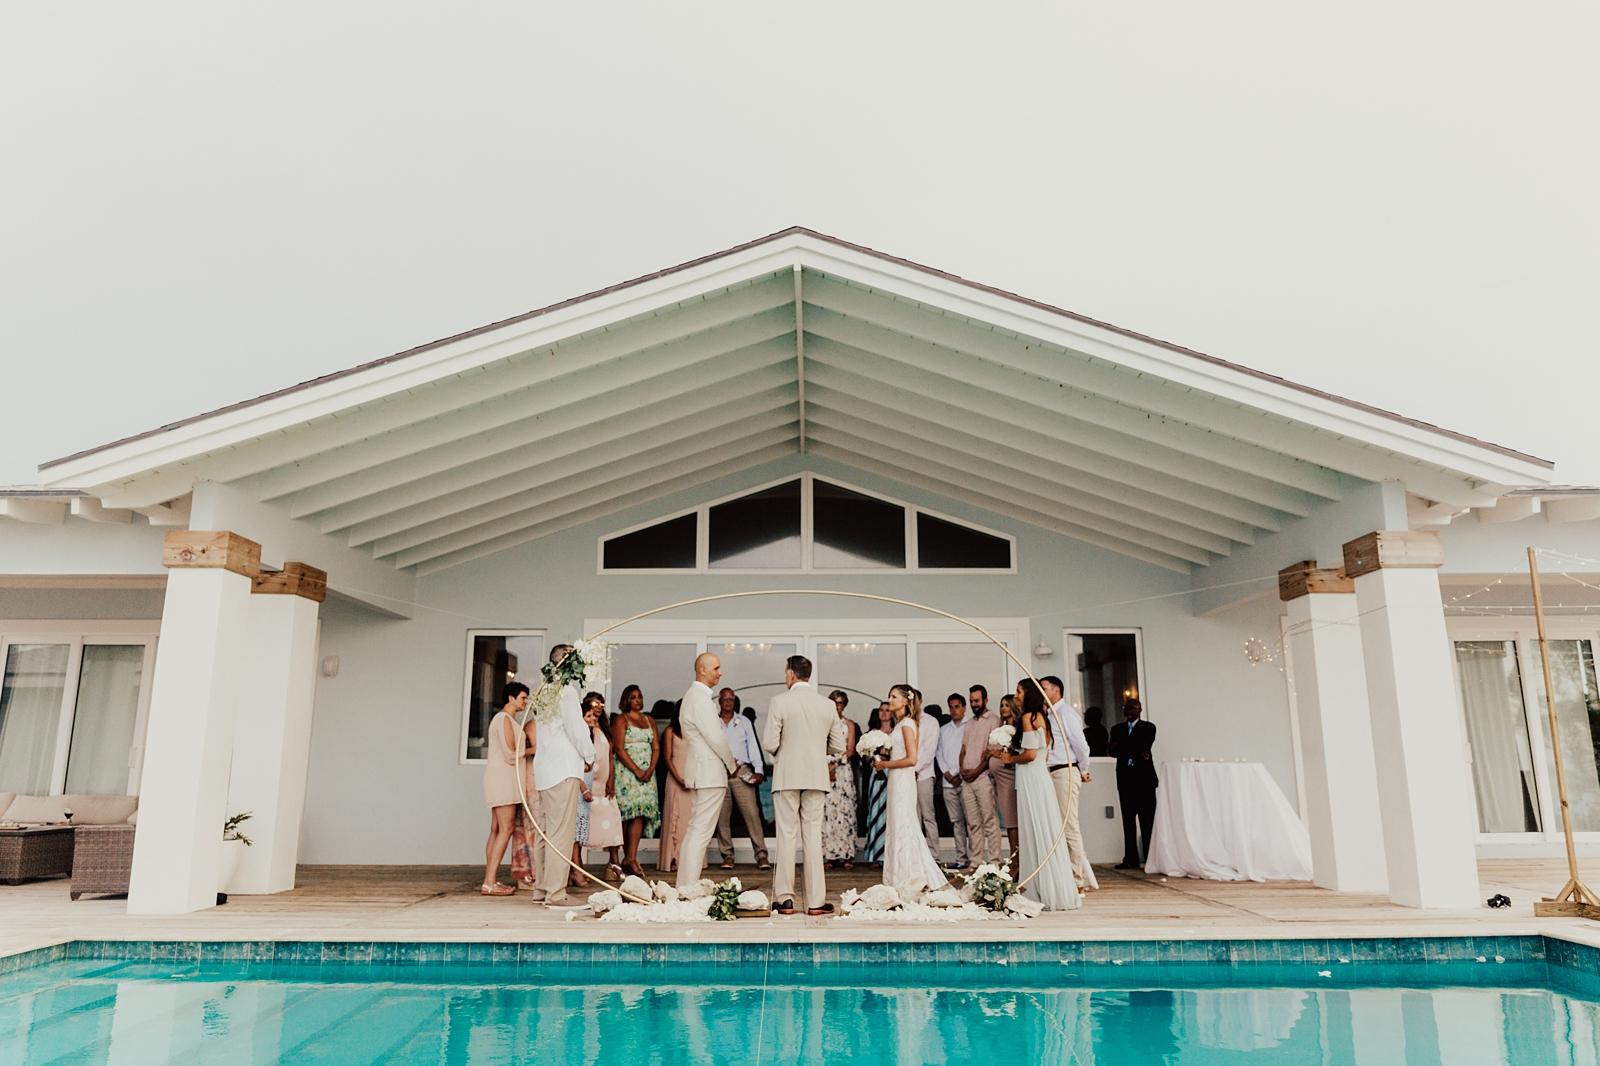 Jenni & Andrew Intimate Beach Destination Wedding in Little Exuma, Bahamas_0506.jpg